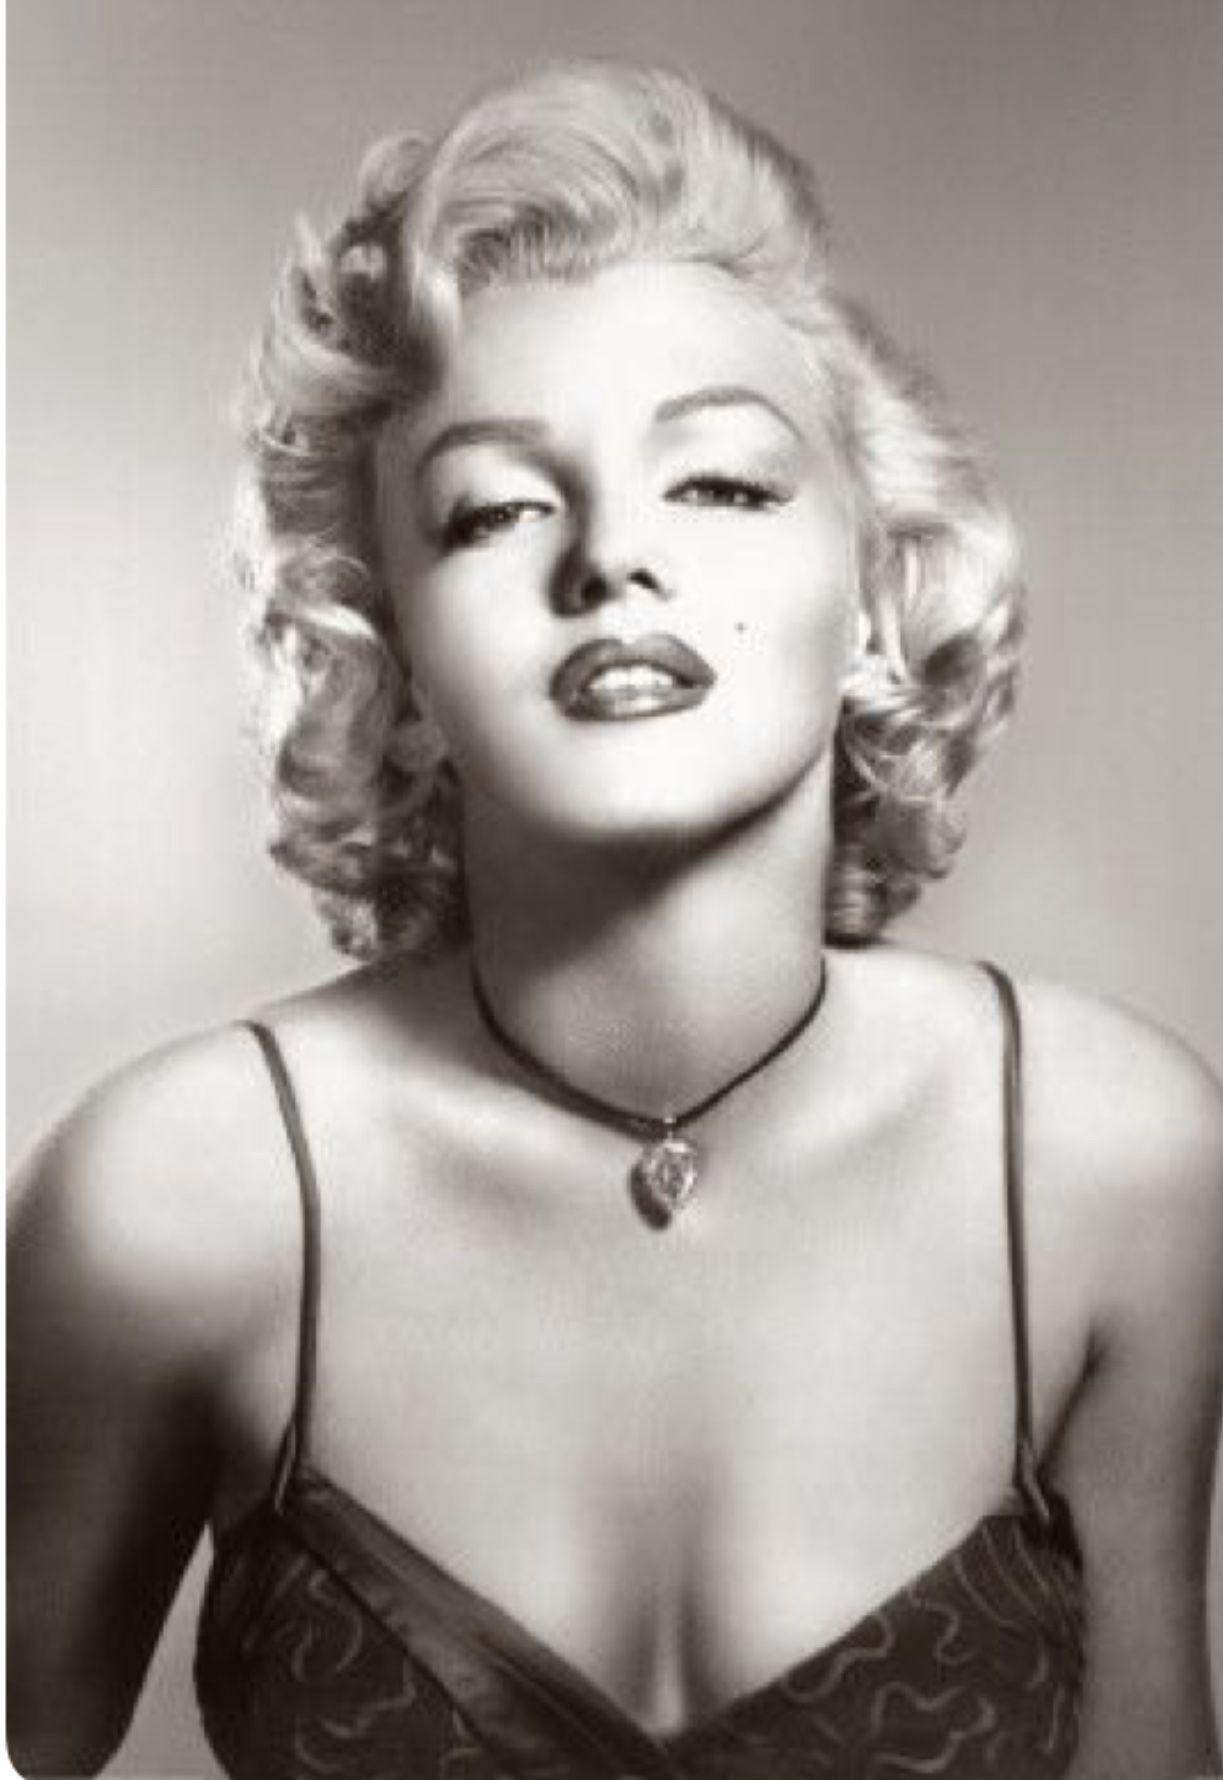 Pin by Lauren Ritchie on Marilyn Monroe | Pinterest